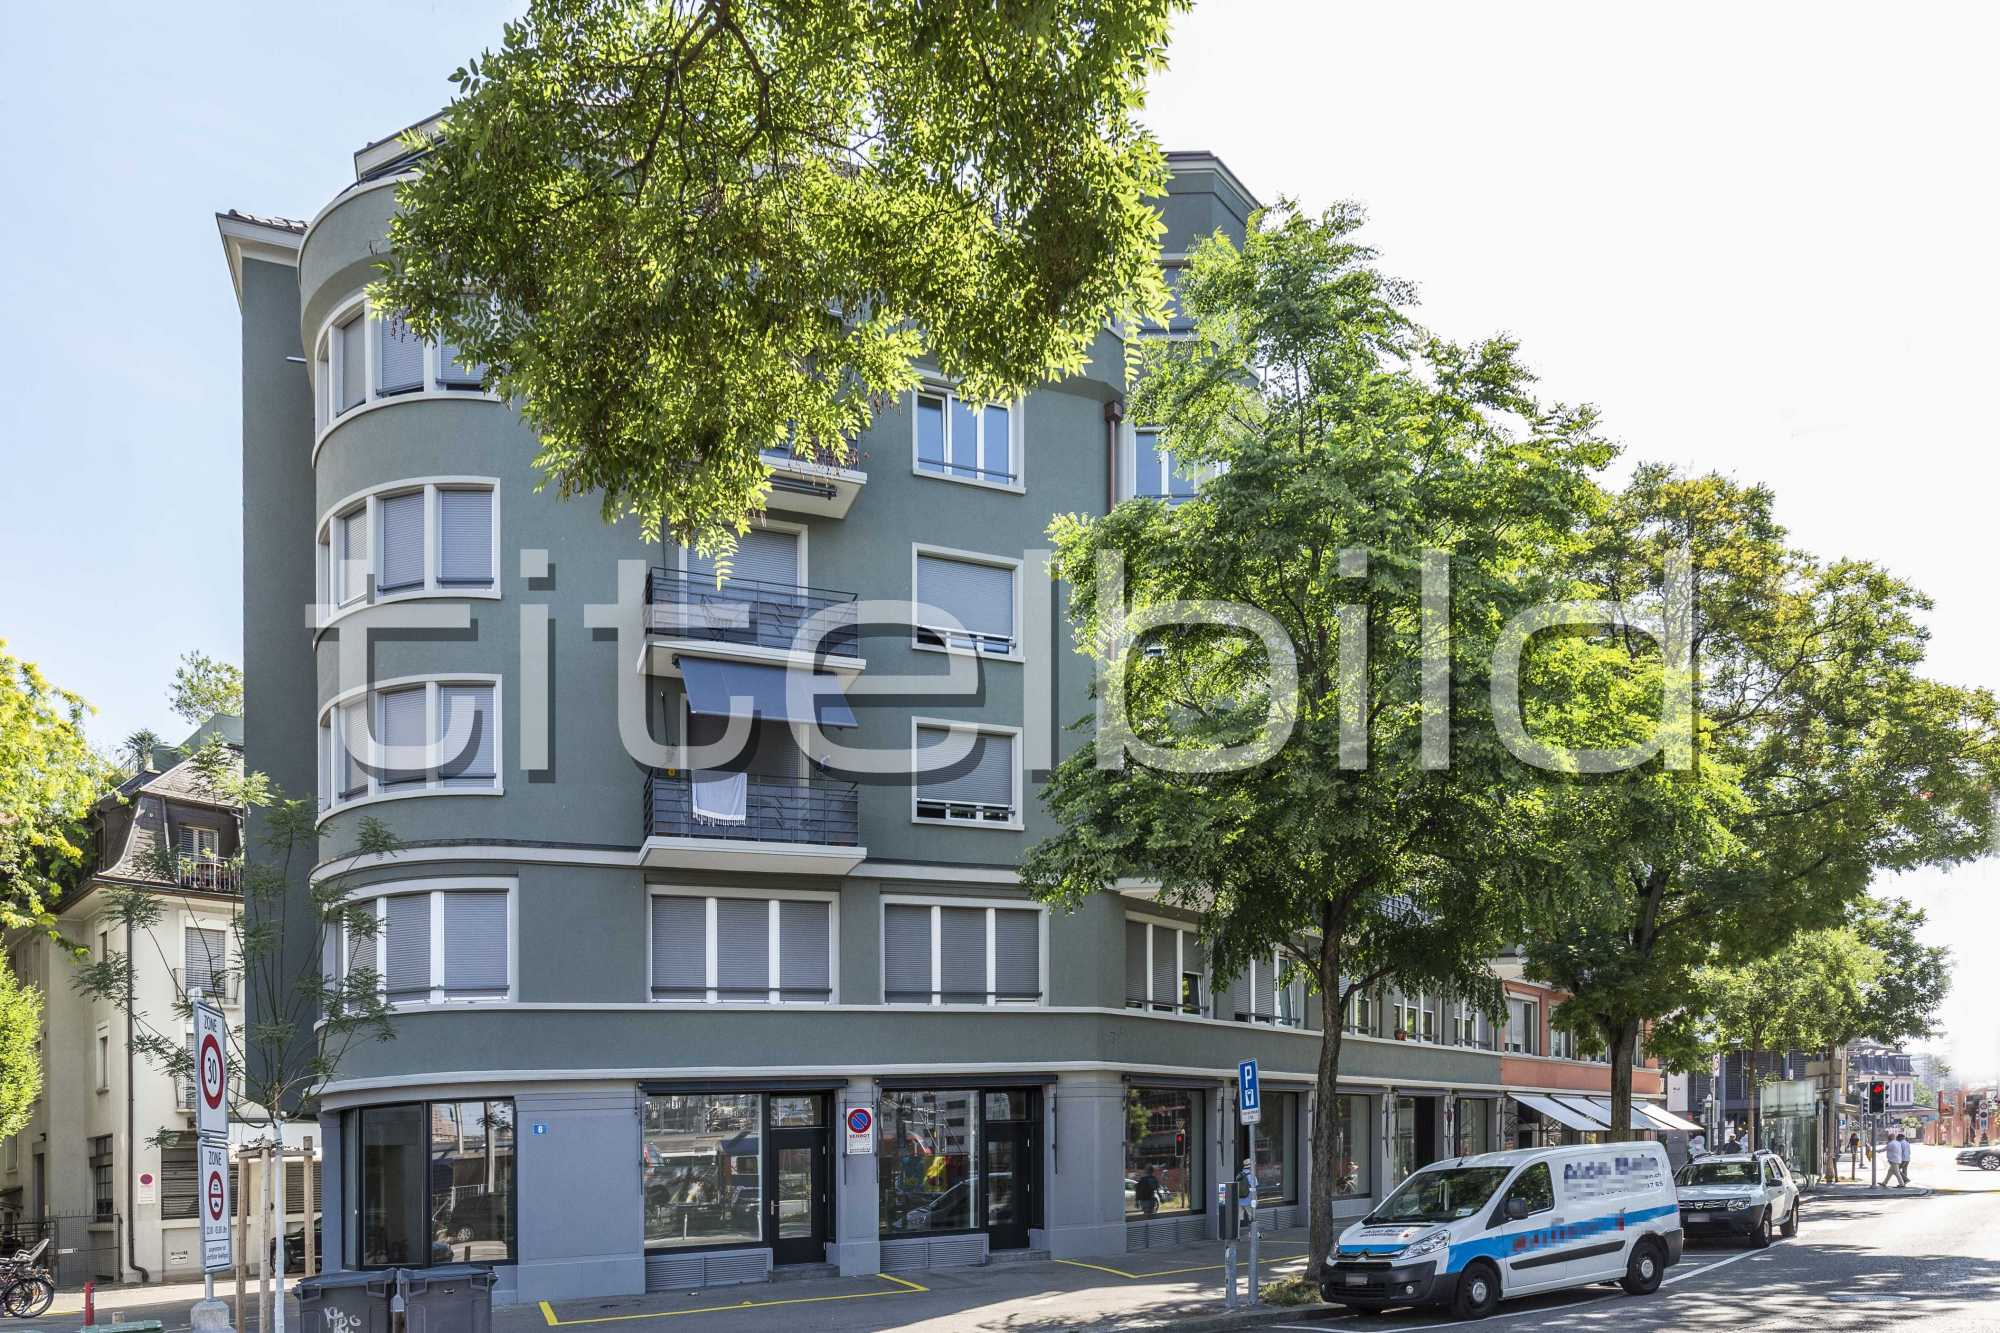 Projektbild-Nr. 0: WGH Röntgenstrasse 4 & 6 in Zürich